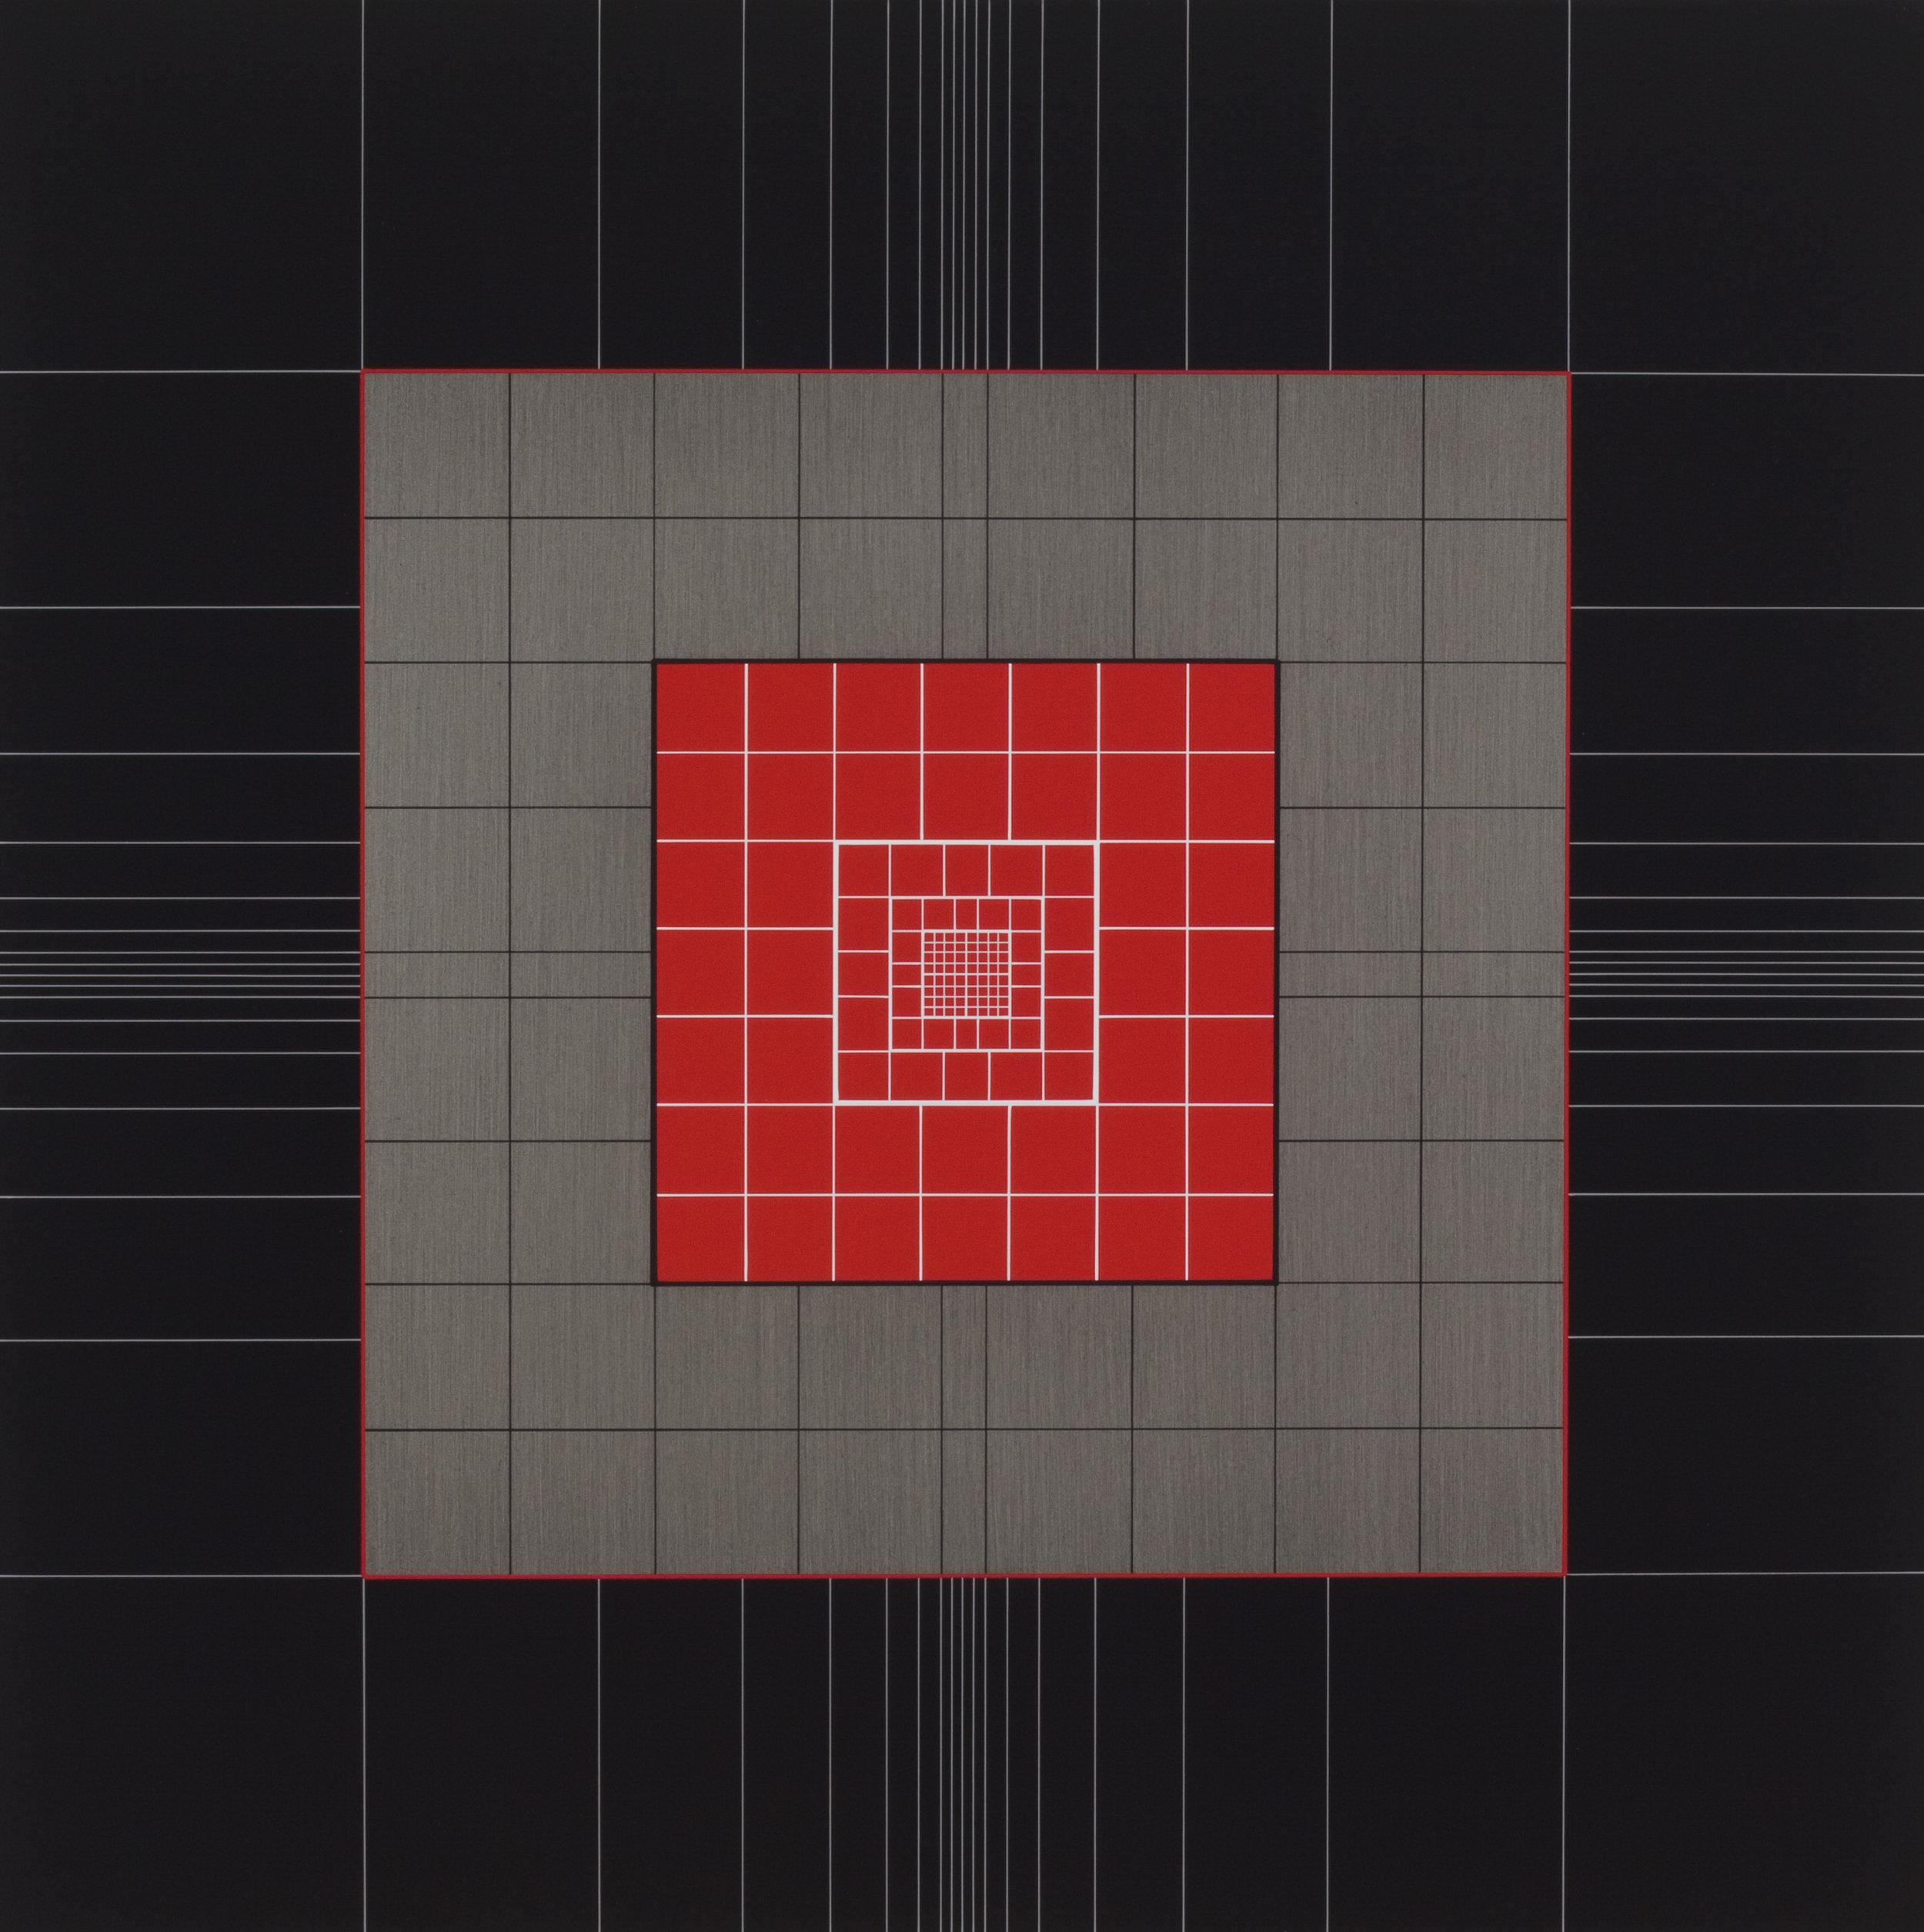 Yantra-ipsum-creator(1)2013.Jan, acrylic on canvas, 27 5/8 x 27 5/8 in. [70x70cm]